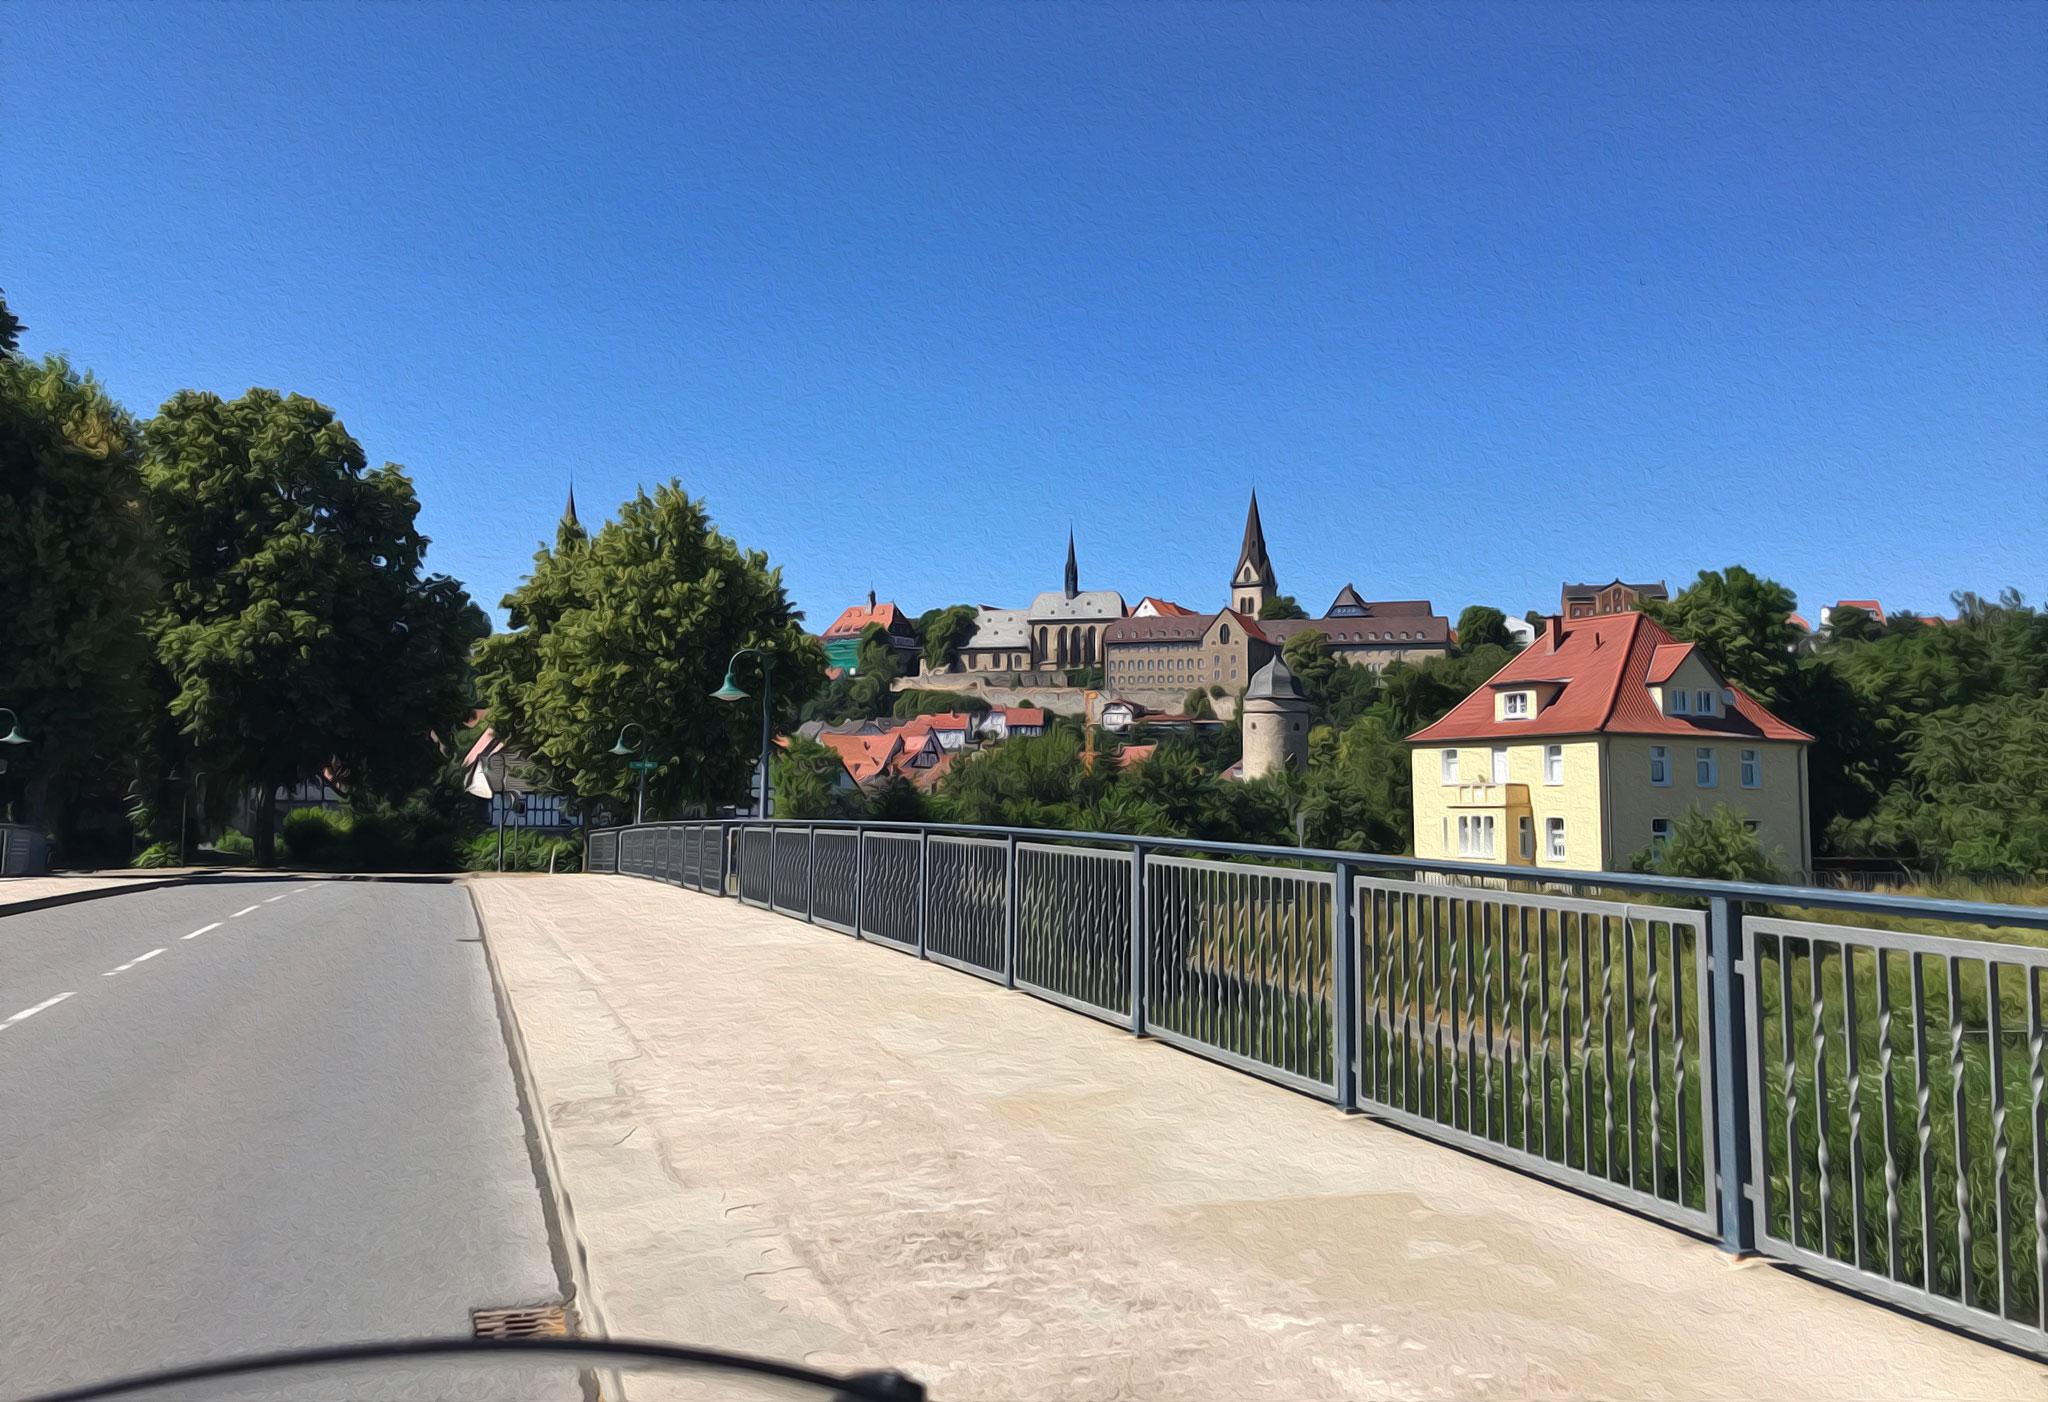 Through Germany: Warburg